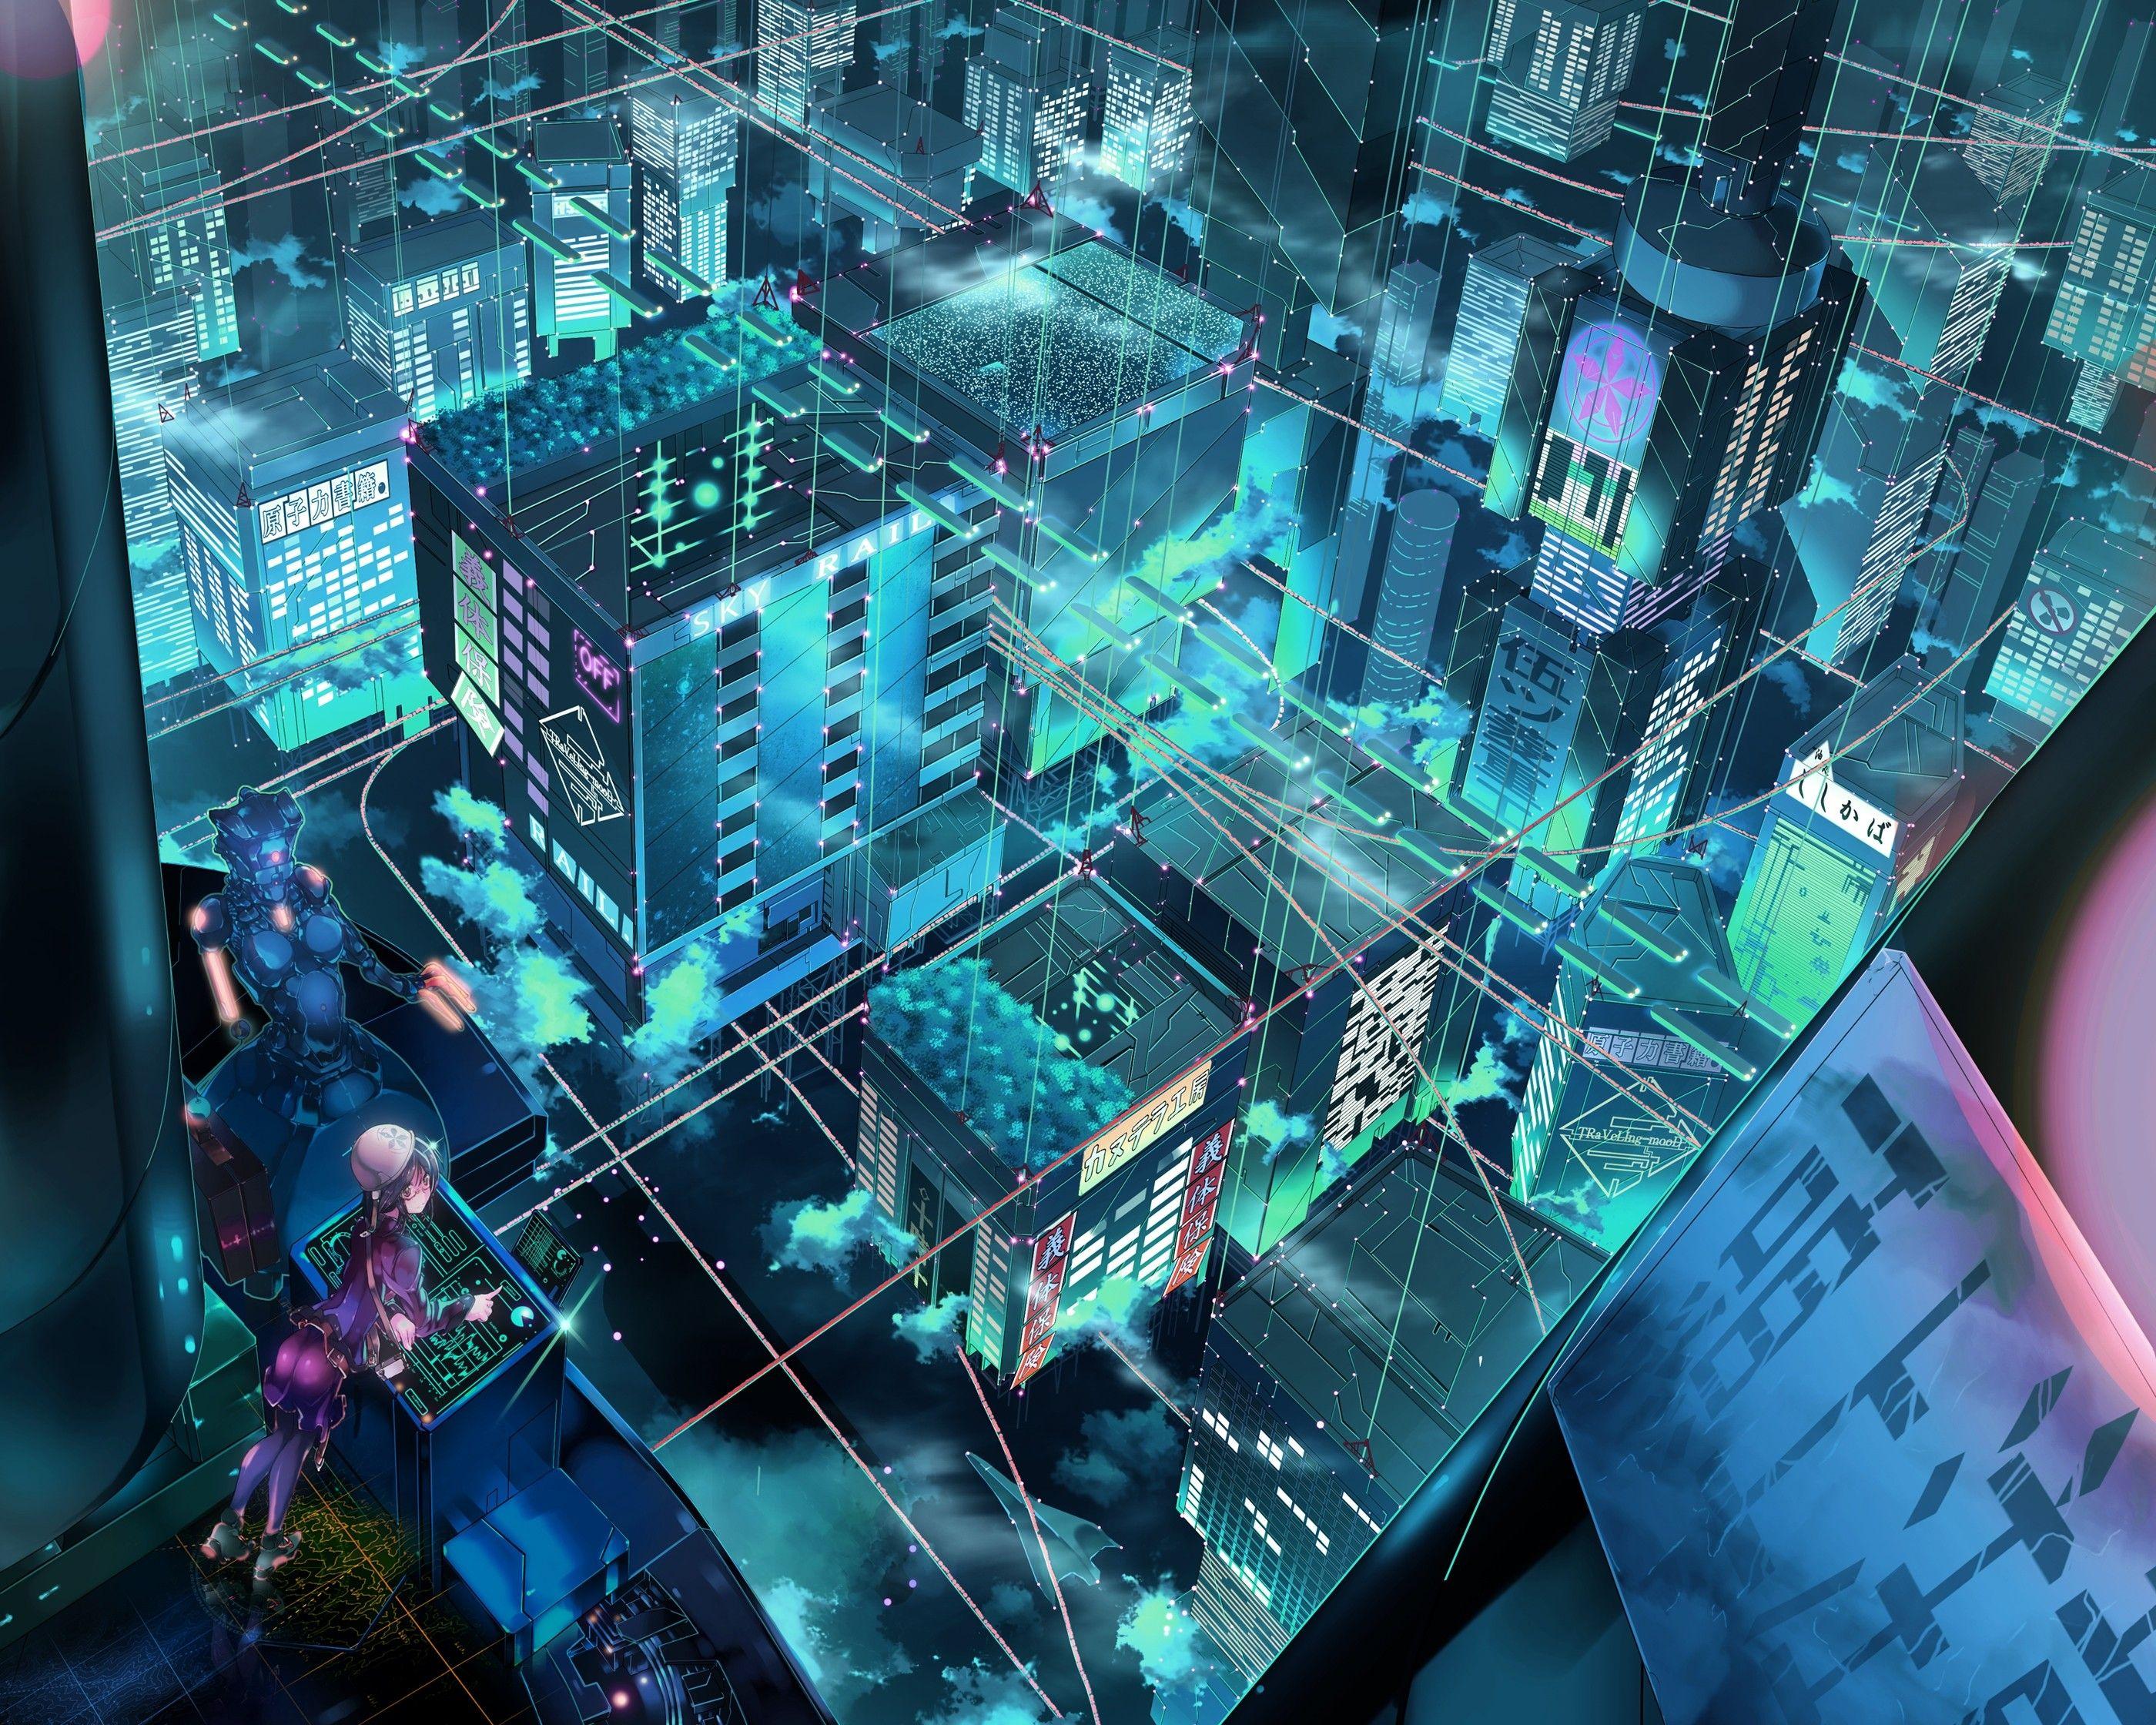 Landscapes Cityscapes Robots Fantasy Art Science Fiction Wallpaper 1076118 Wallbase Cc Anime Scenery Anime Scenery Wallpaper Anime City Futuristic anime wallpaper 1920x1080